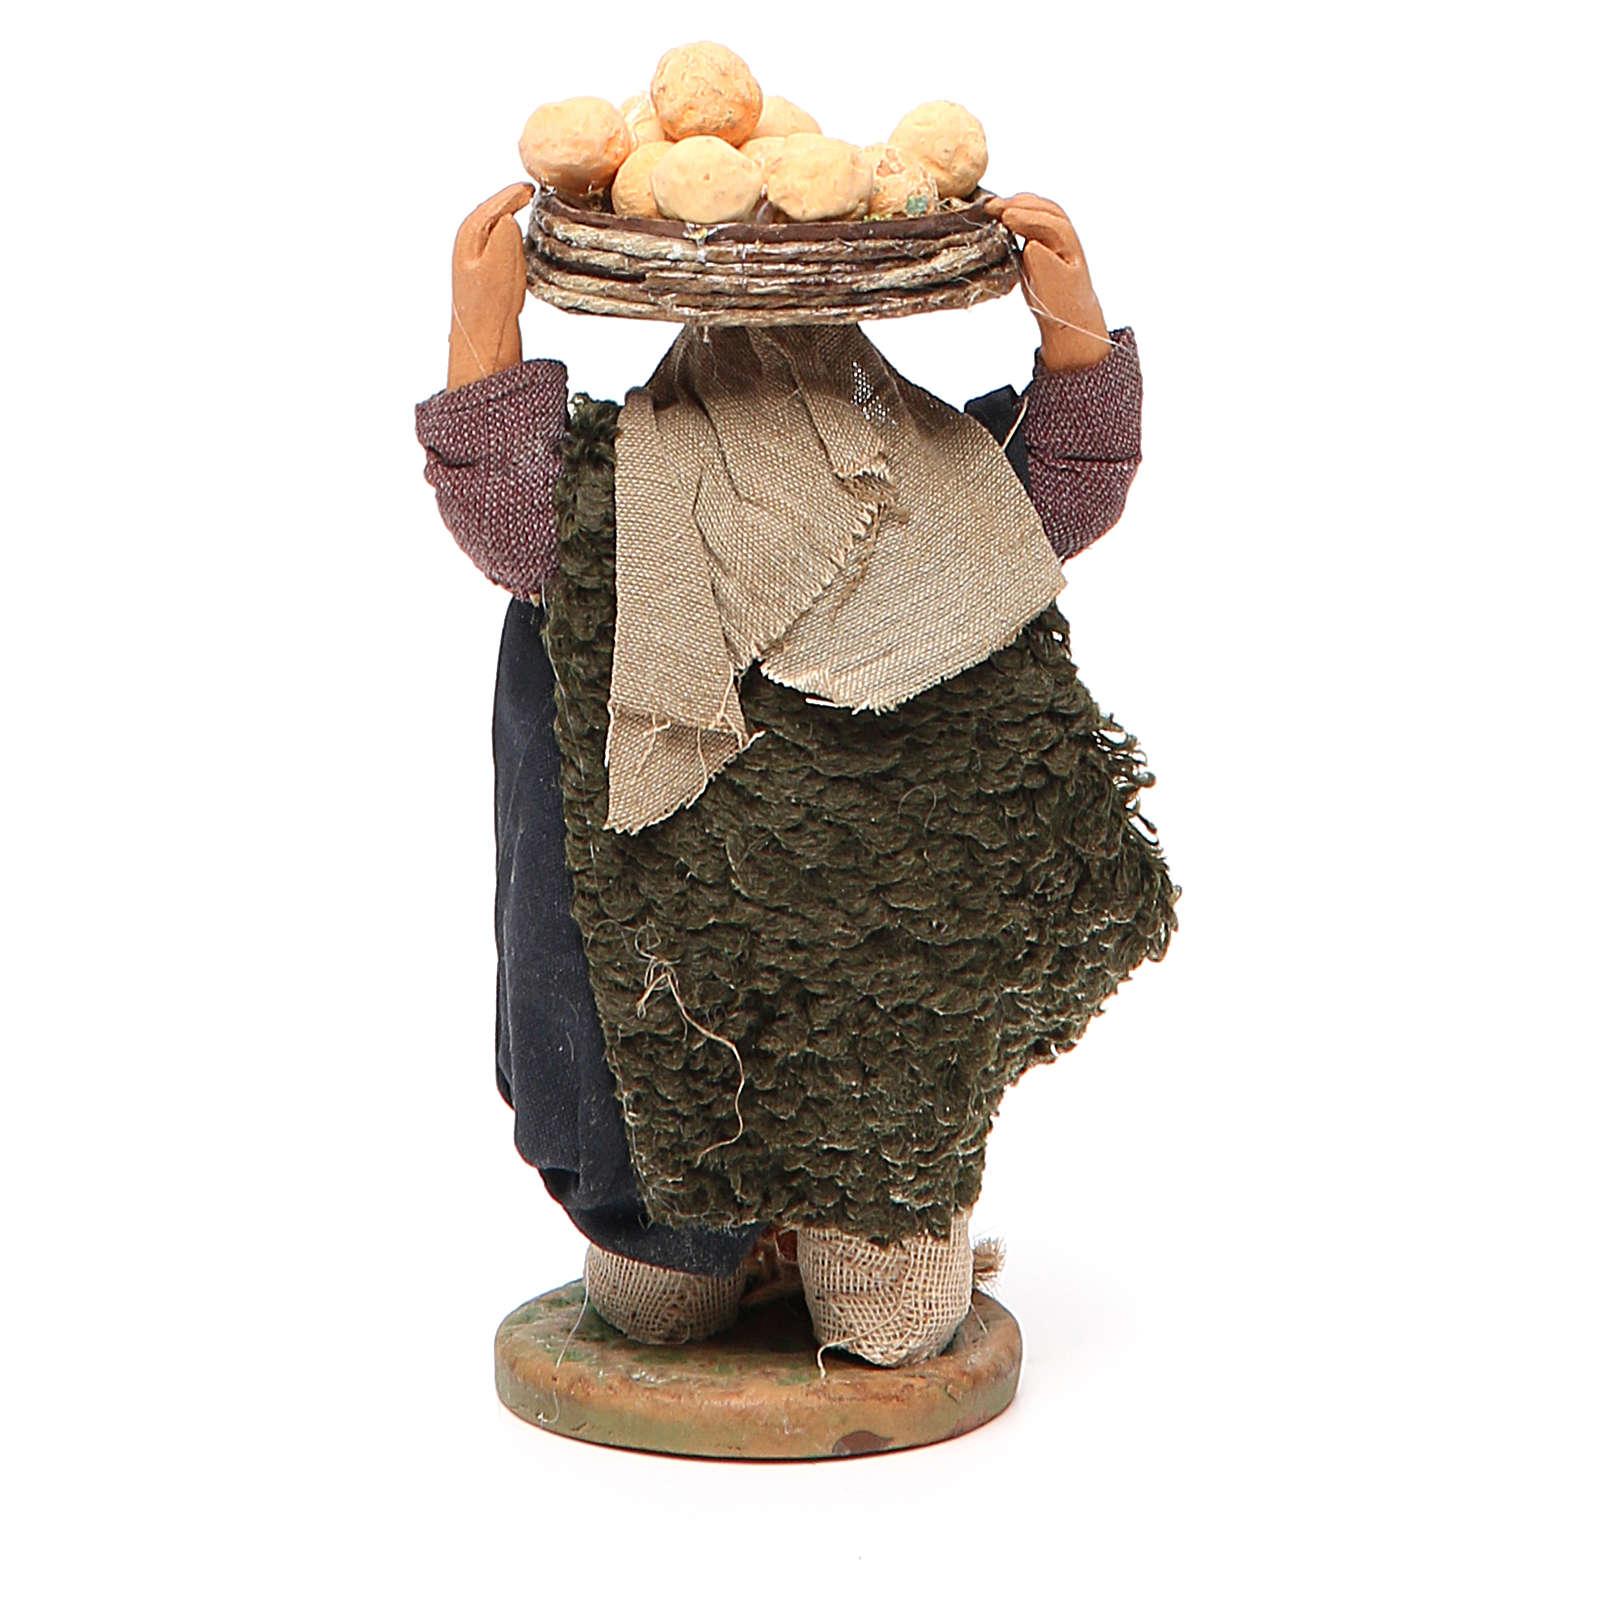 Man with oranges on head, Neapolitan nativity figurine 10cm 4